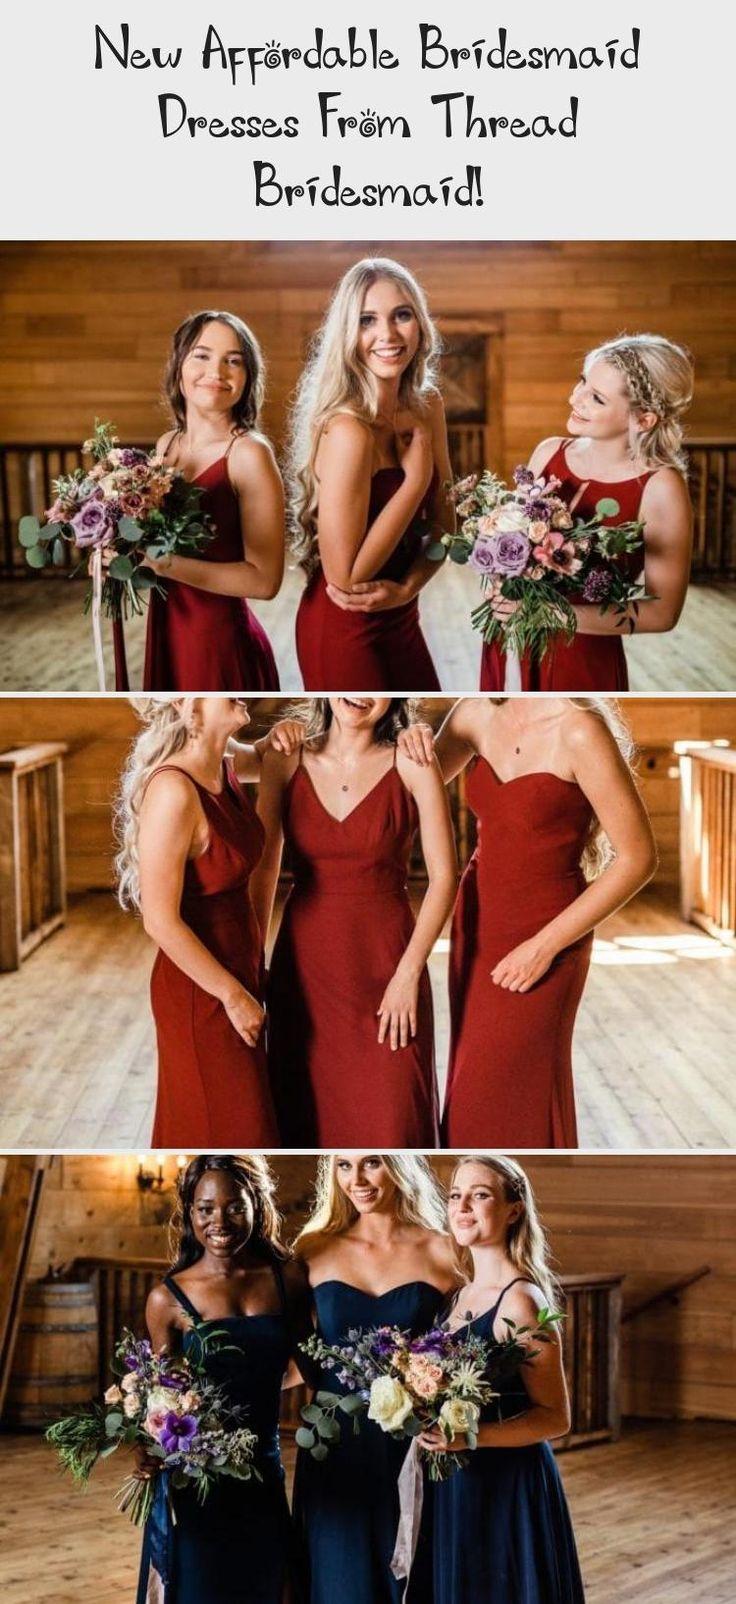 Light blue boho style affordable dresses for bridesmaids from Thread Bridesmaid! #bridesmaids #bridesmaid #bridesmaiddresses #FloralBridesmaidDresses #IvoryBridesmaidDresses #BridesmaidDressesPastel #MaroonBridesmaidDresses #BridesmaidDressesMauve